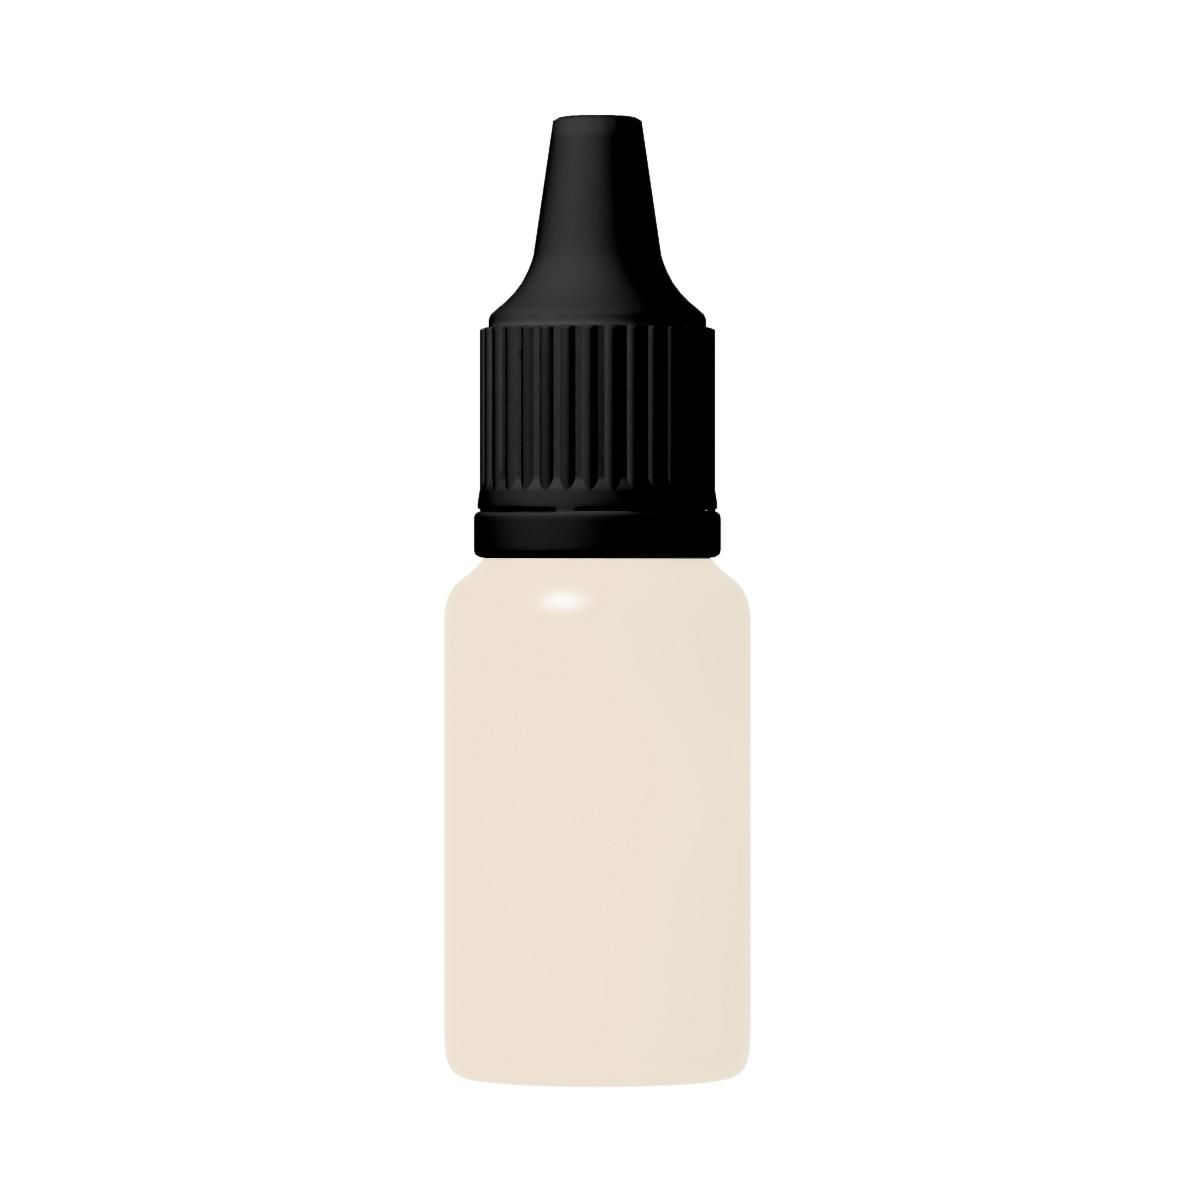 TFC Giessharz Farbpaste RAL1013 perlweiss